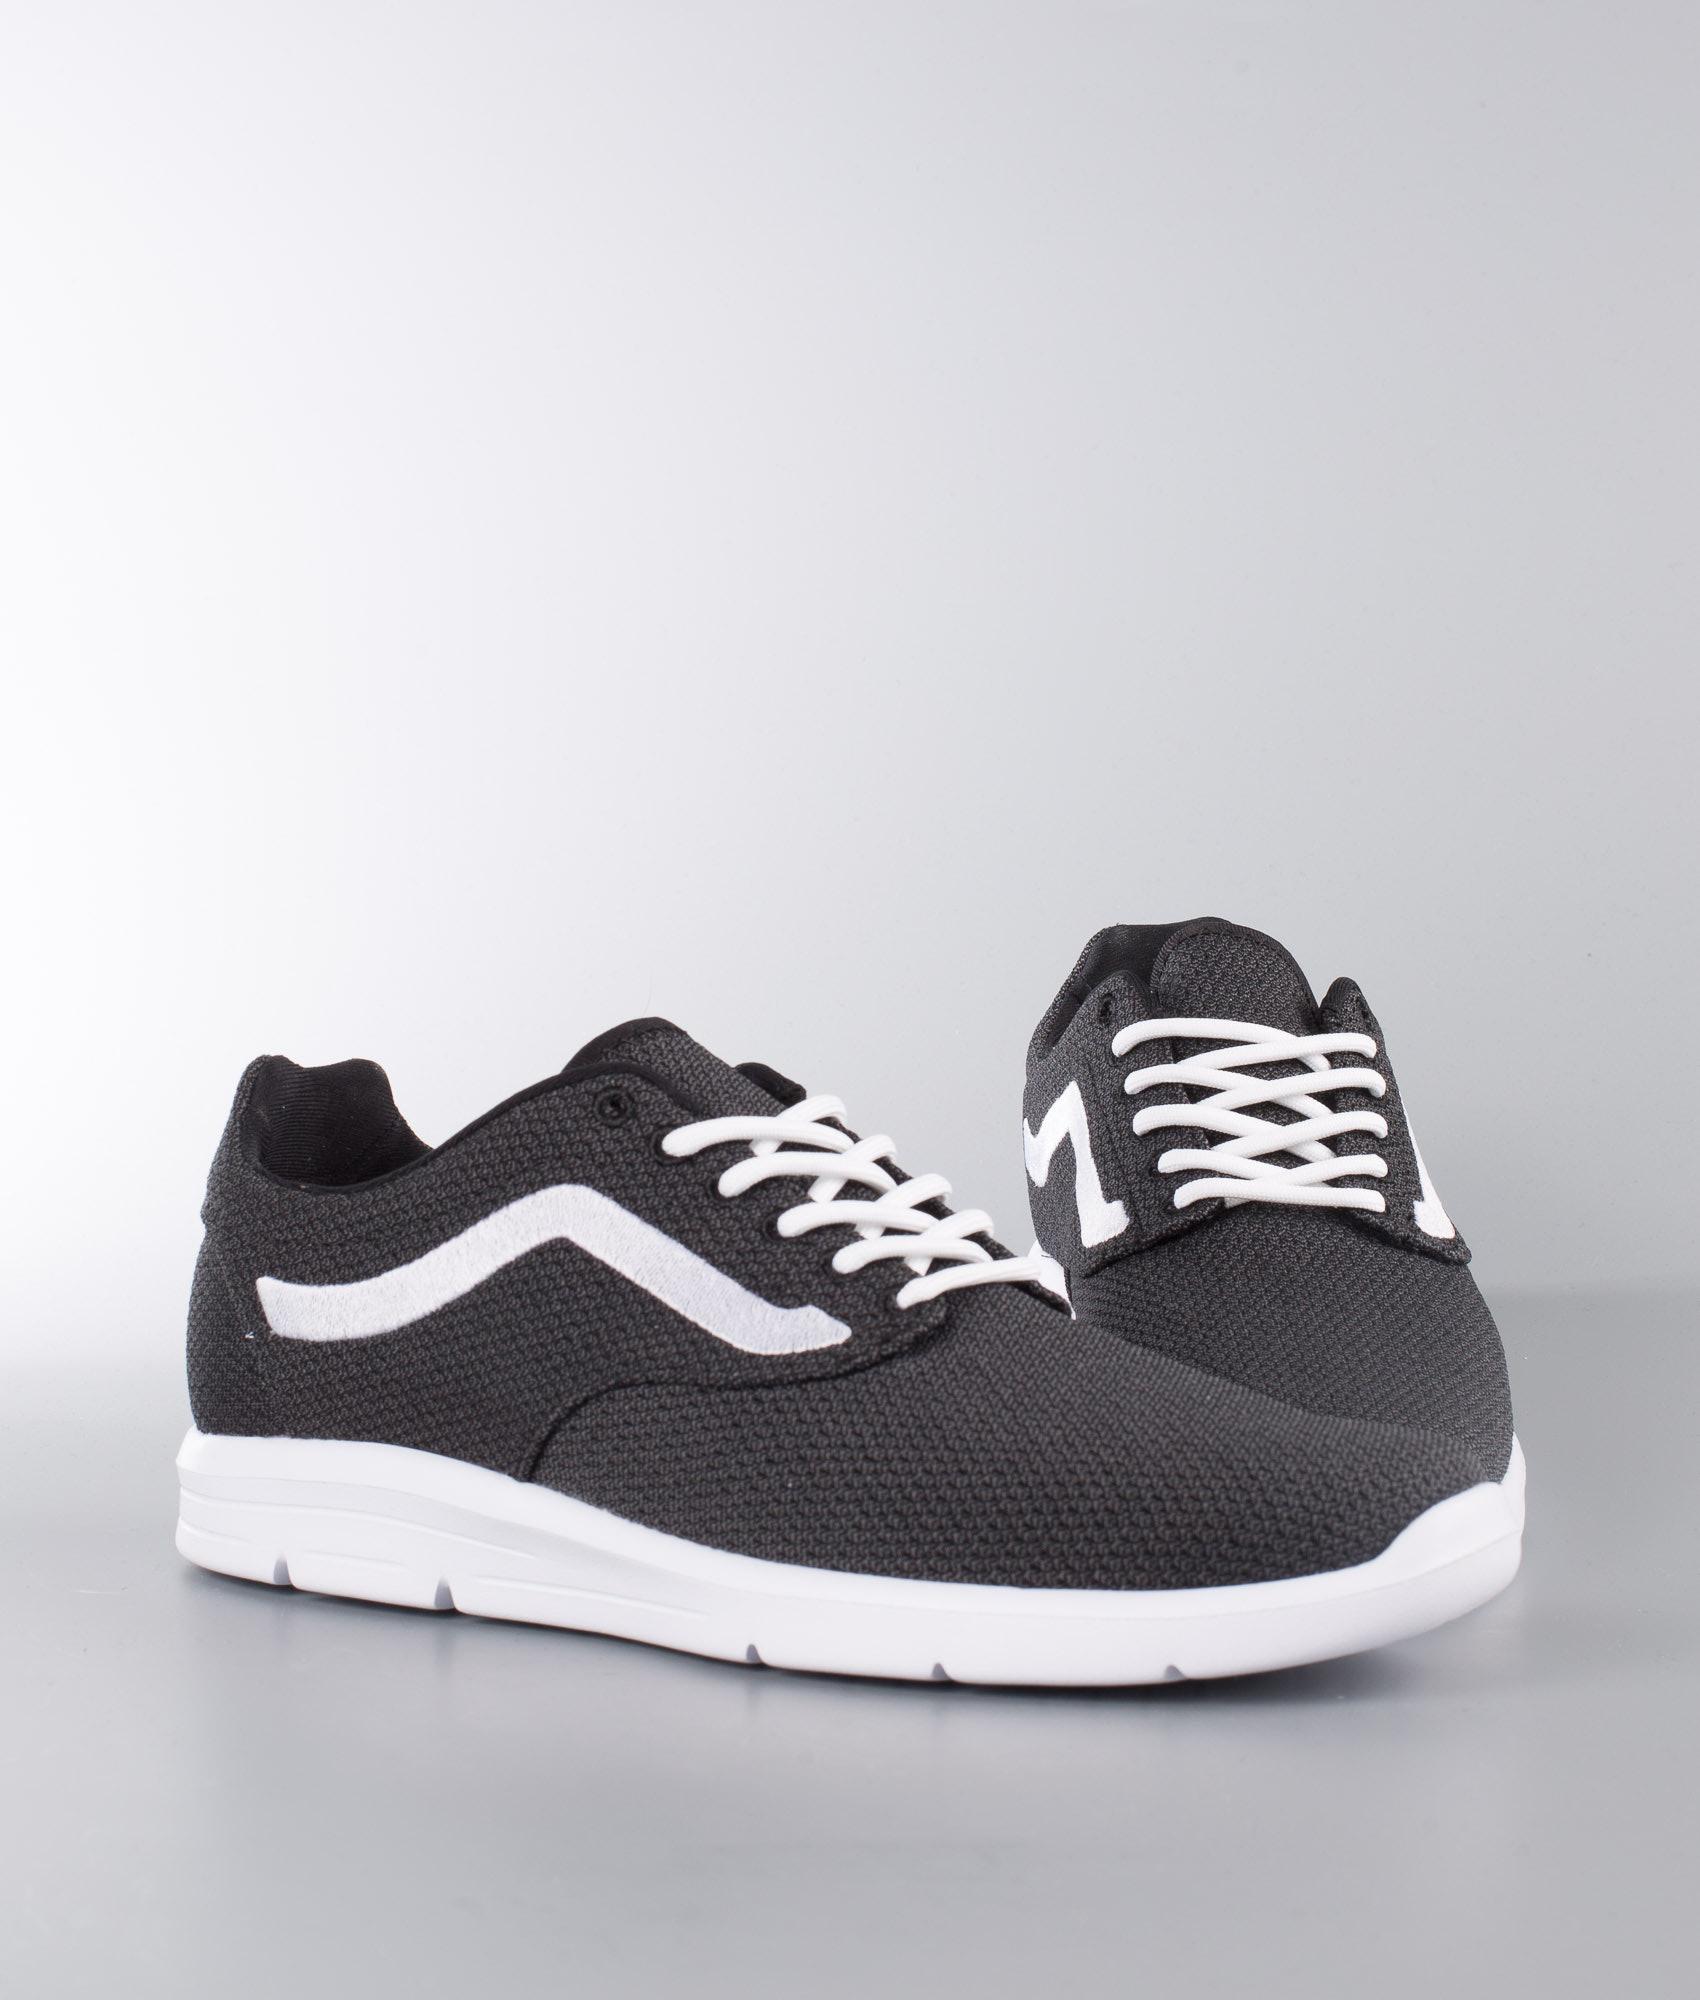 ebed5d88d9c6f4 Vans Iso 1.5 Shoes (Mesh) Black Asphalt True White - Ridestore.com